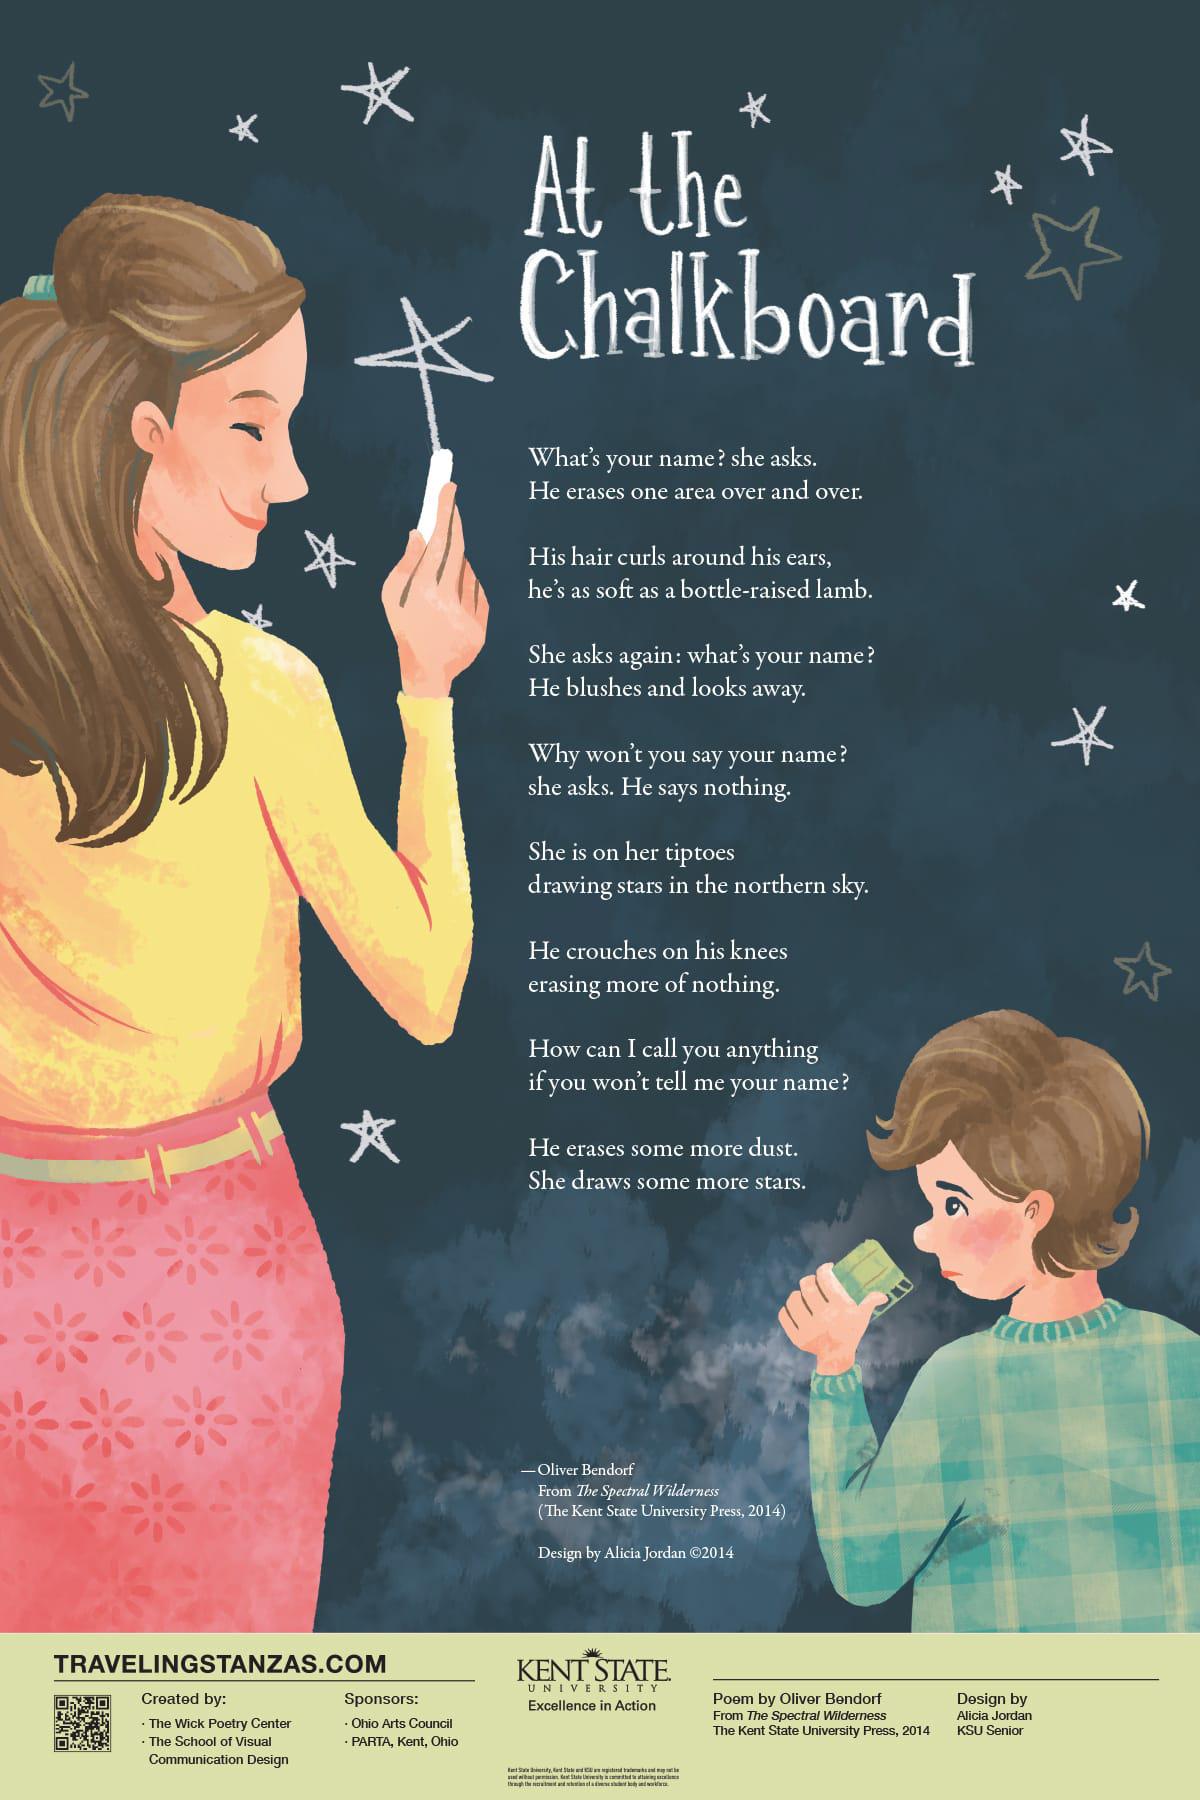 AtTheChalkboard-Bendorf-Poster